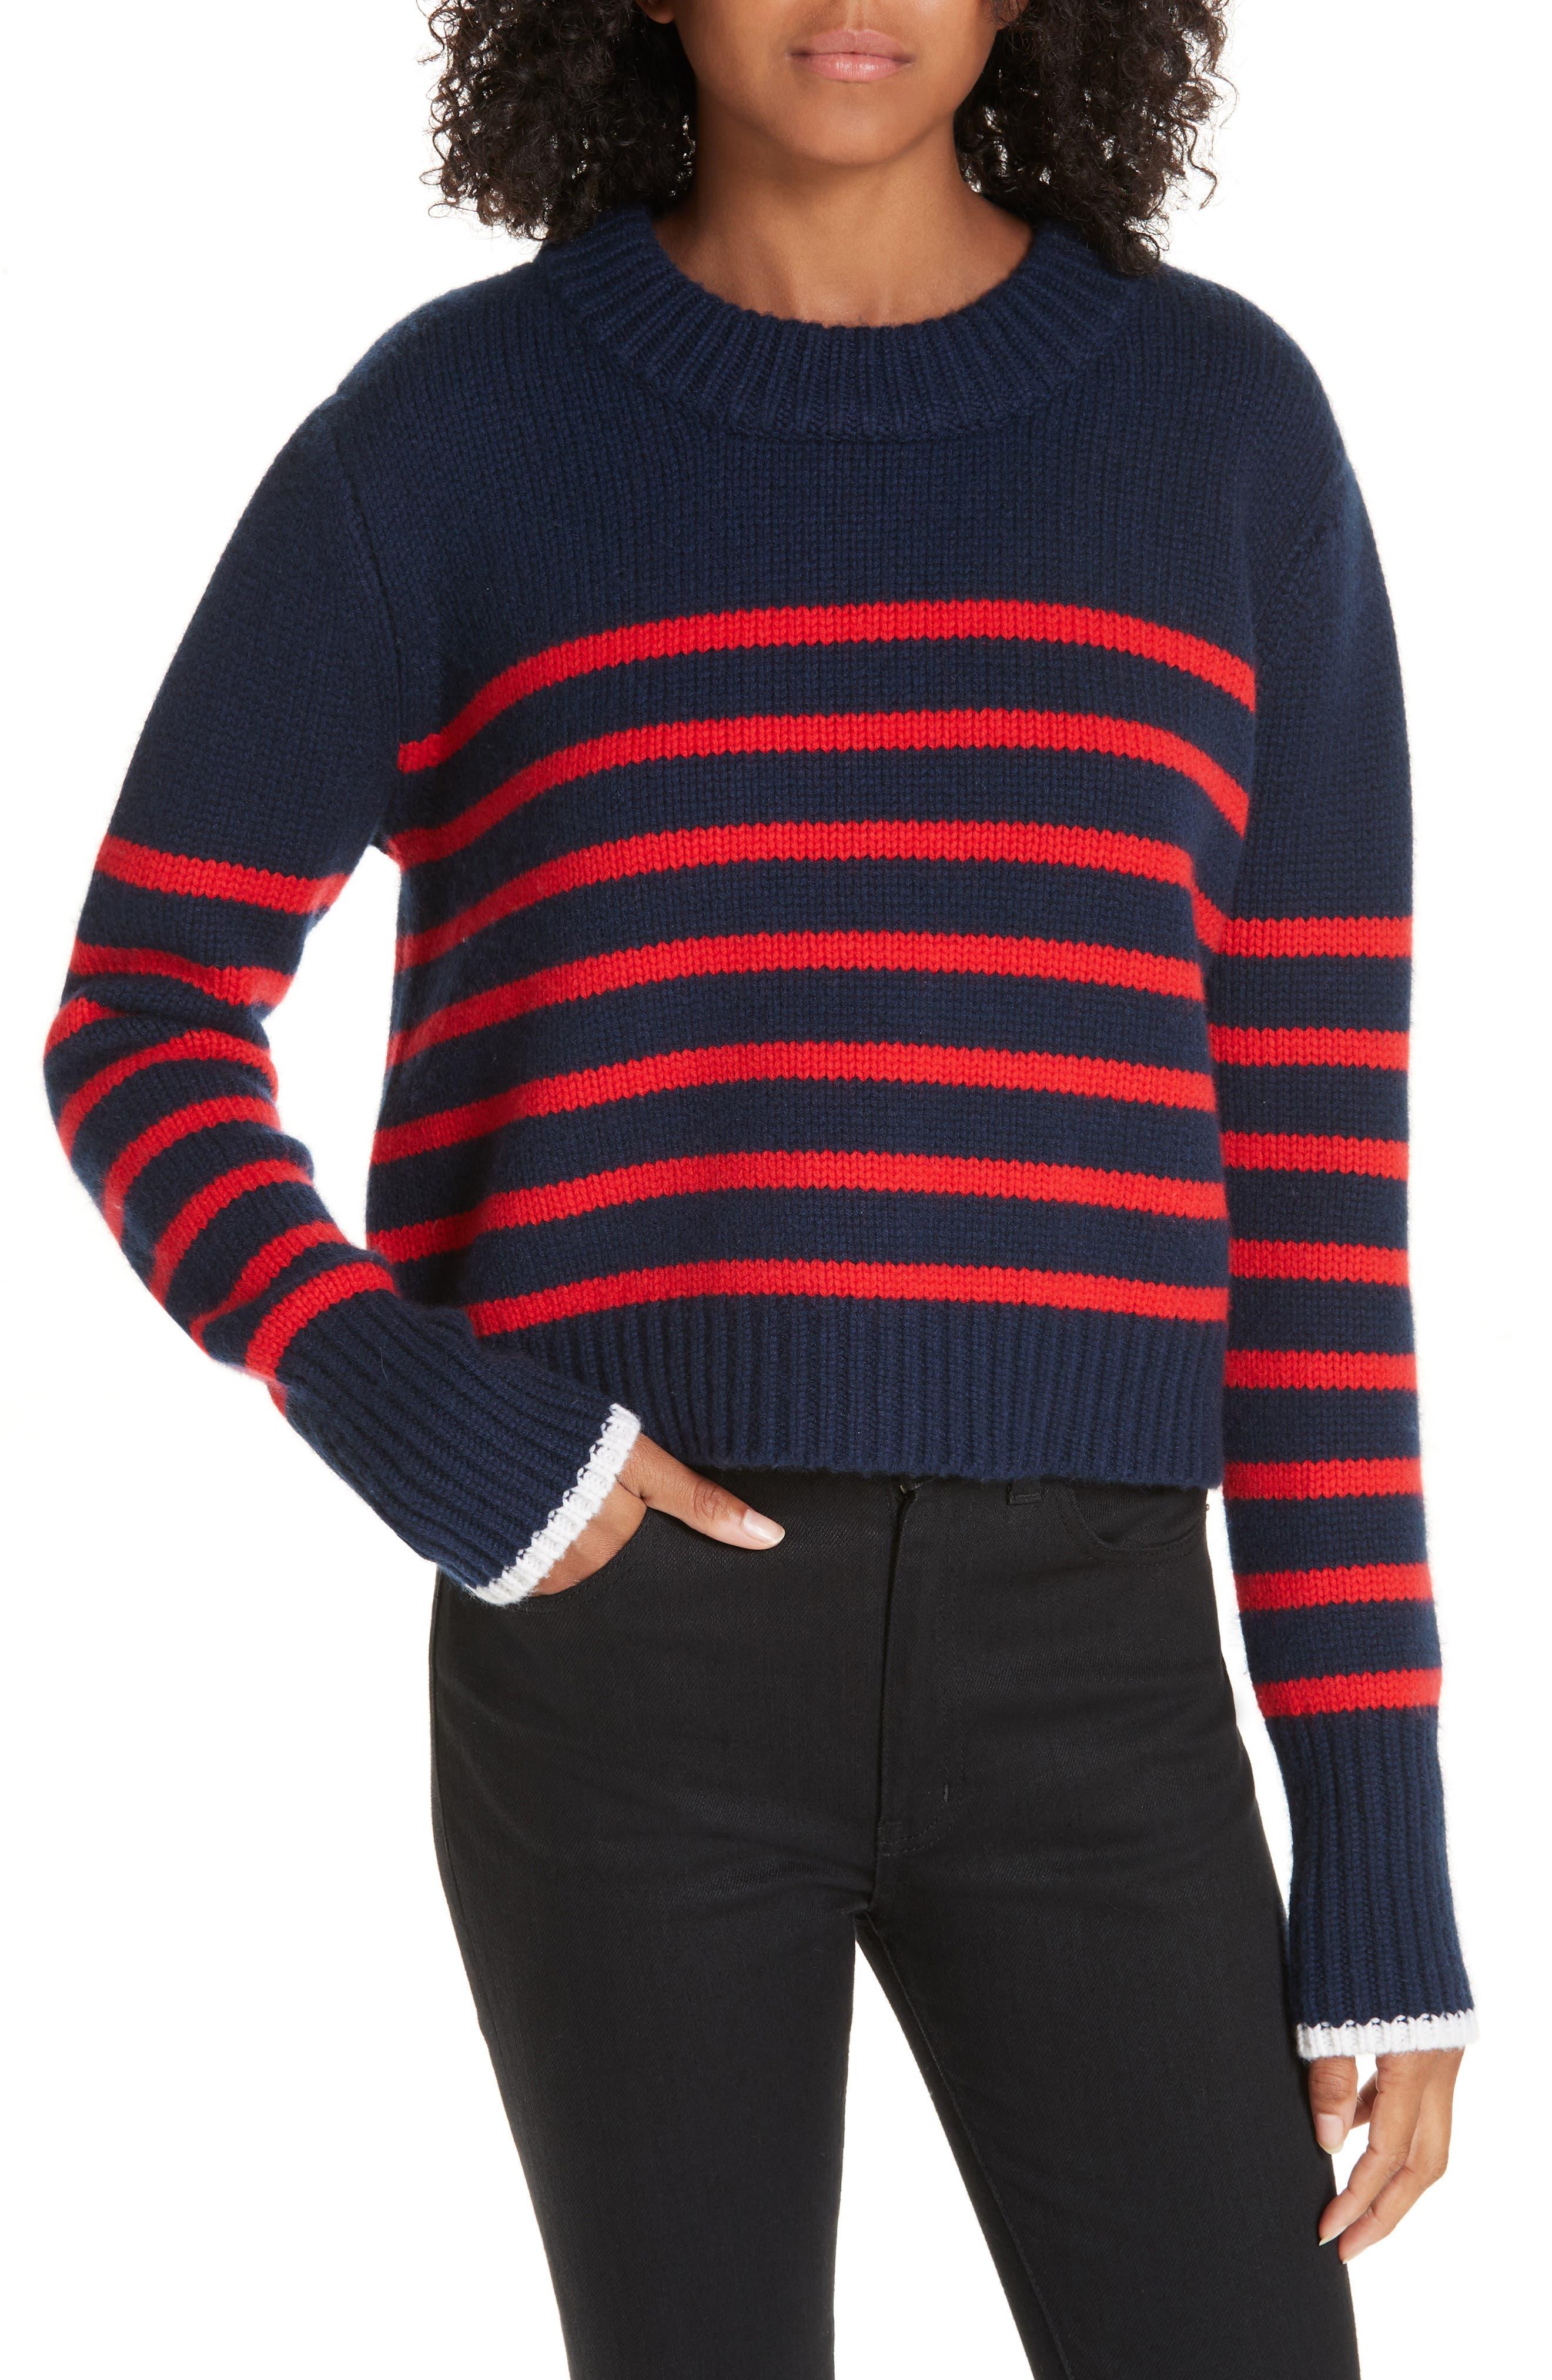 La Ligne Mini Maren Wool & Cashmere Sweater